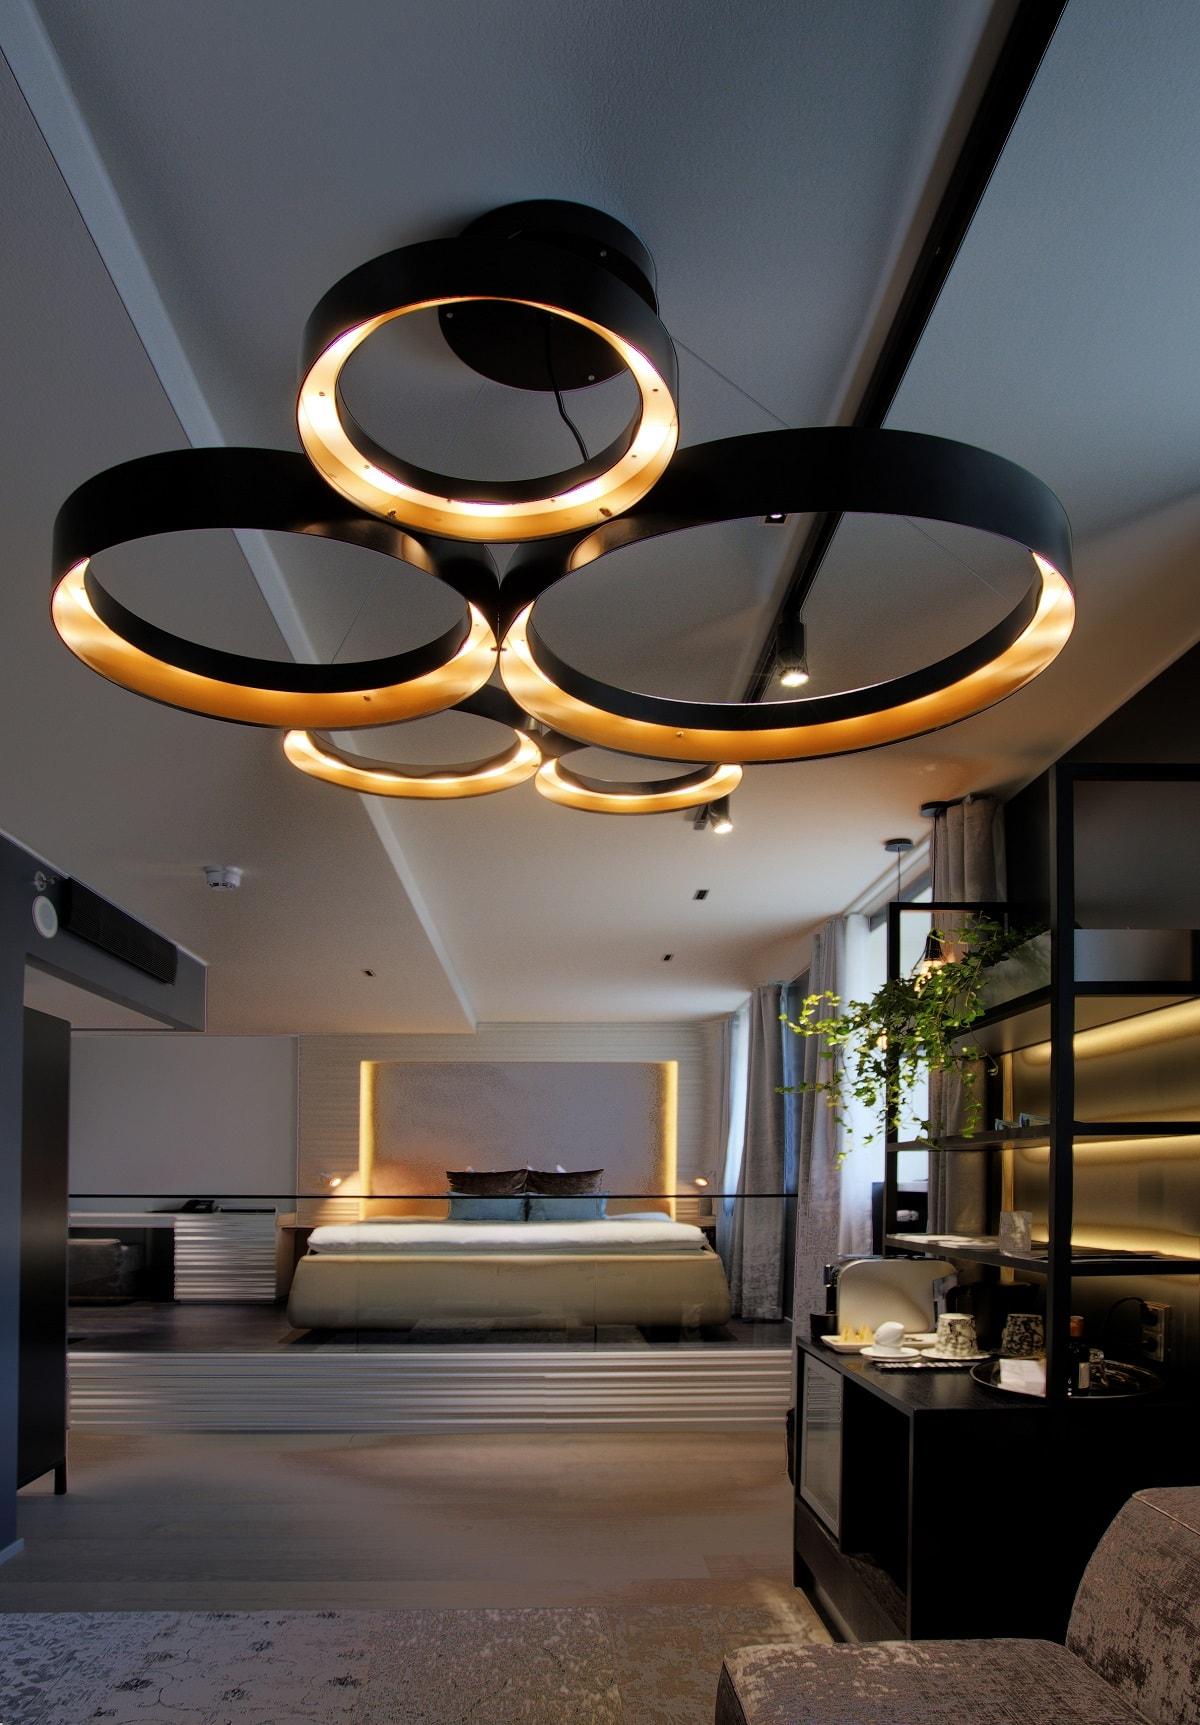 interesting-pop-ceiling-designs-aida-homes-10-impressive-bedroom-ideas_home-ciling-in-plafod-designs